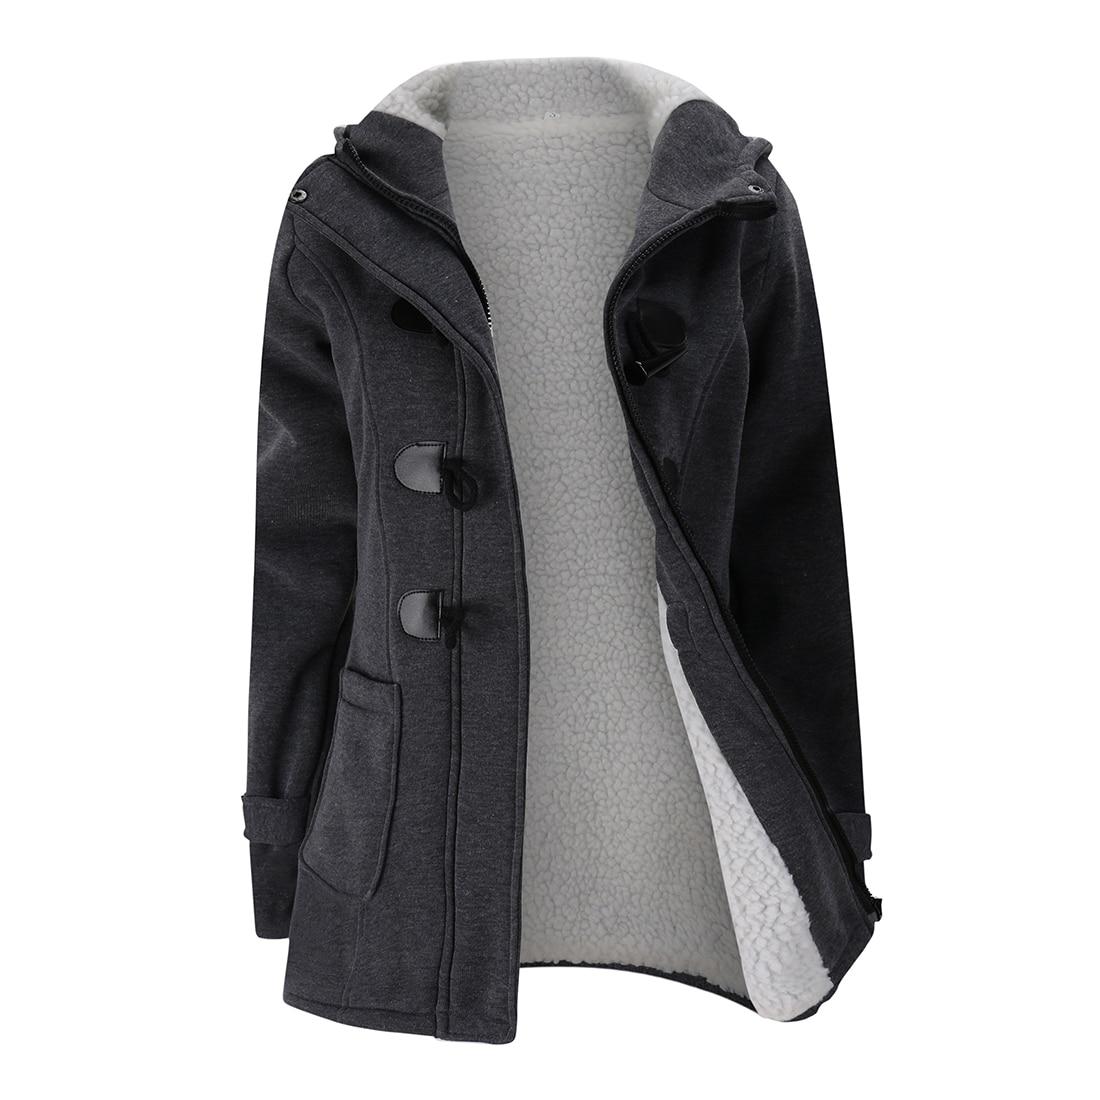 2018 Women Trench Coat Autumn Warm Lining Winter Jacket Overcoat Female Casual Long Hooded Coat Zipper Horn Button Outwear 50